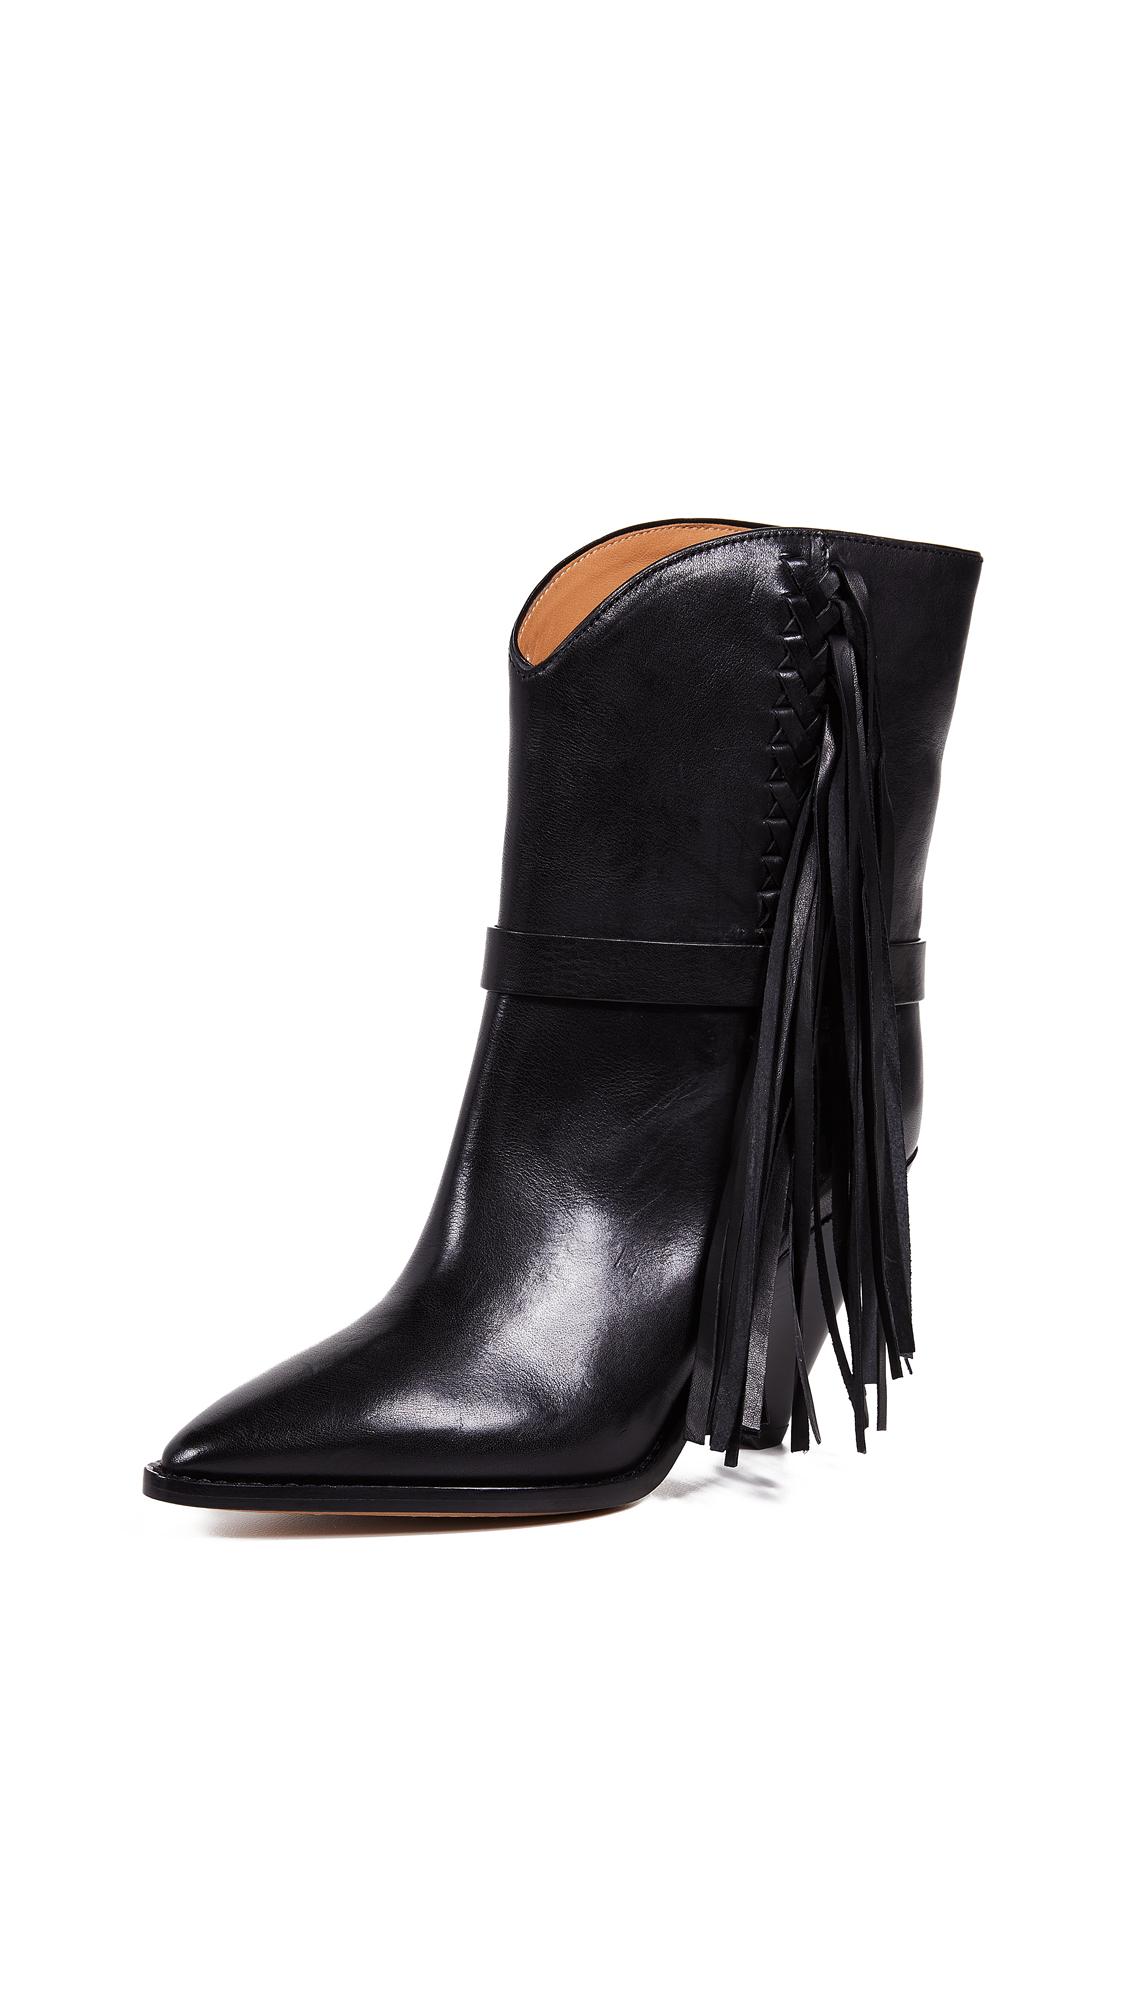 Isabel Marant Loffen Boots - Black